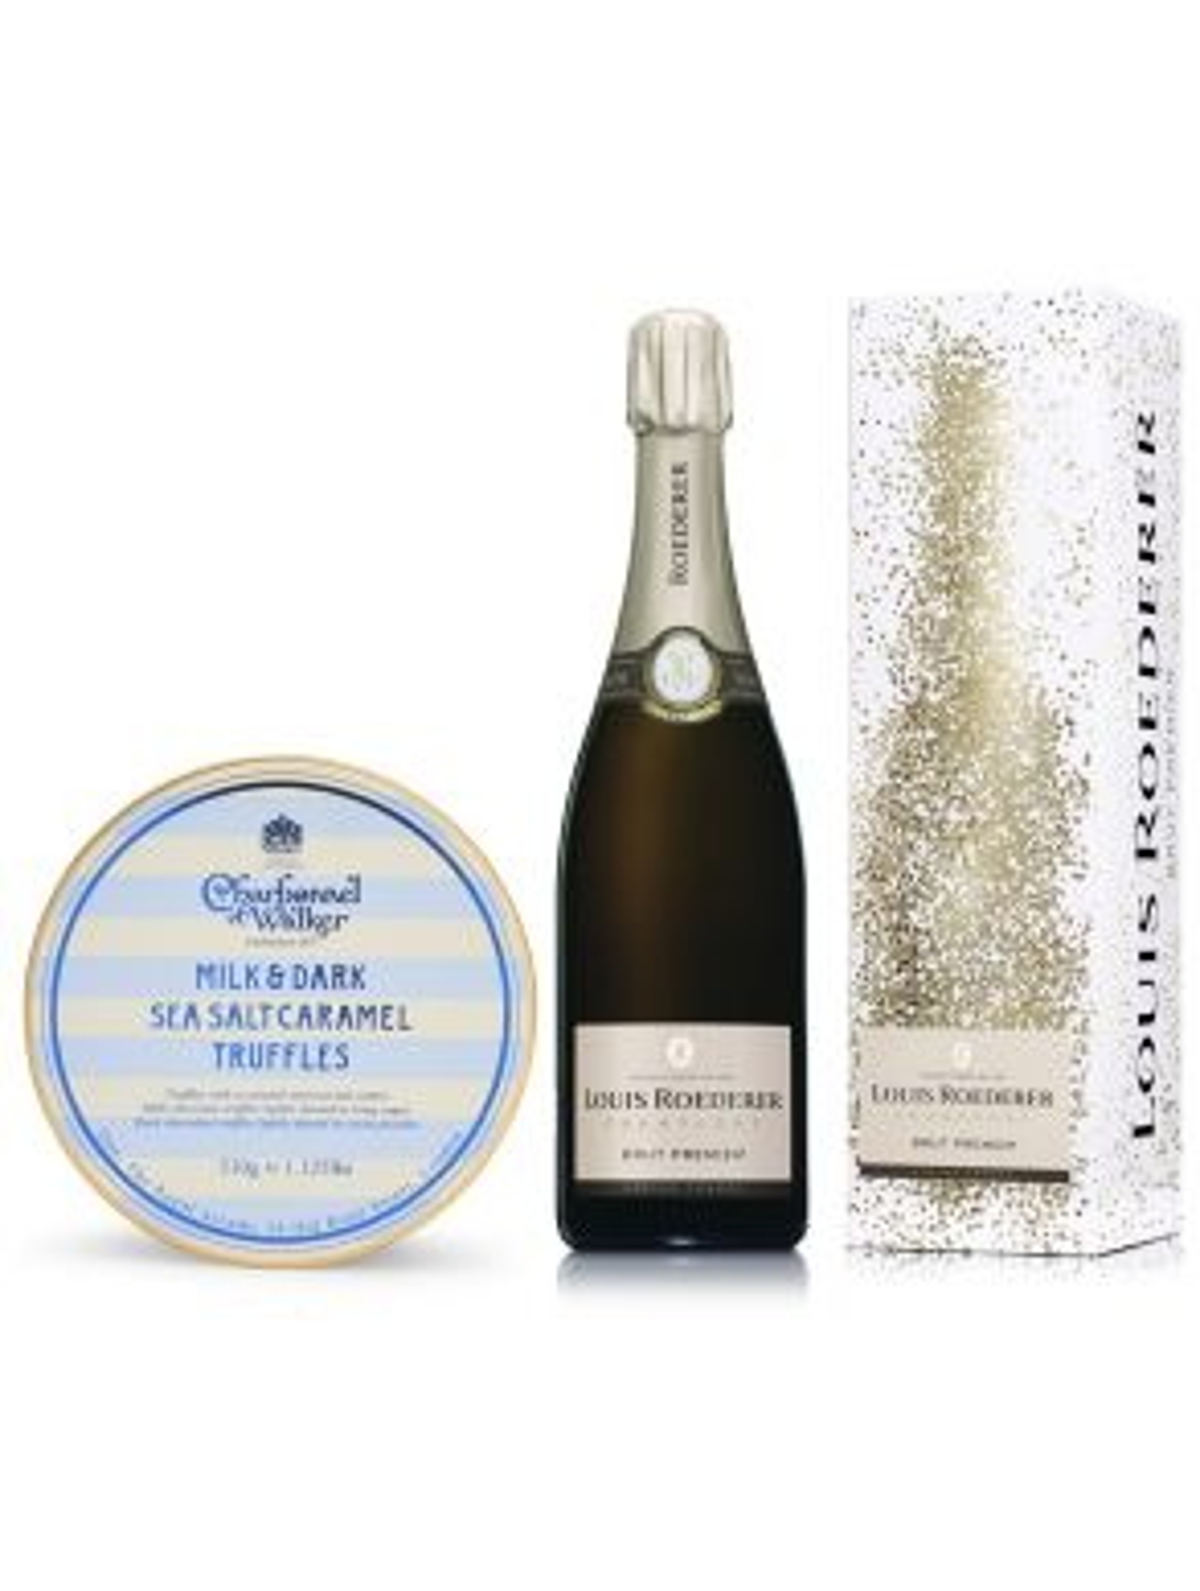 Louis Roederer Brut Premier Champagne 75cl & Sea Salt Truffles 510g